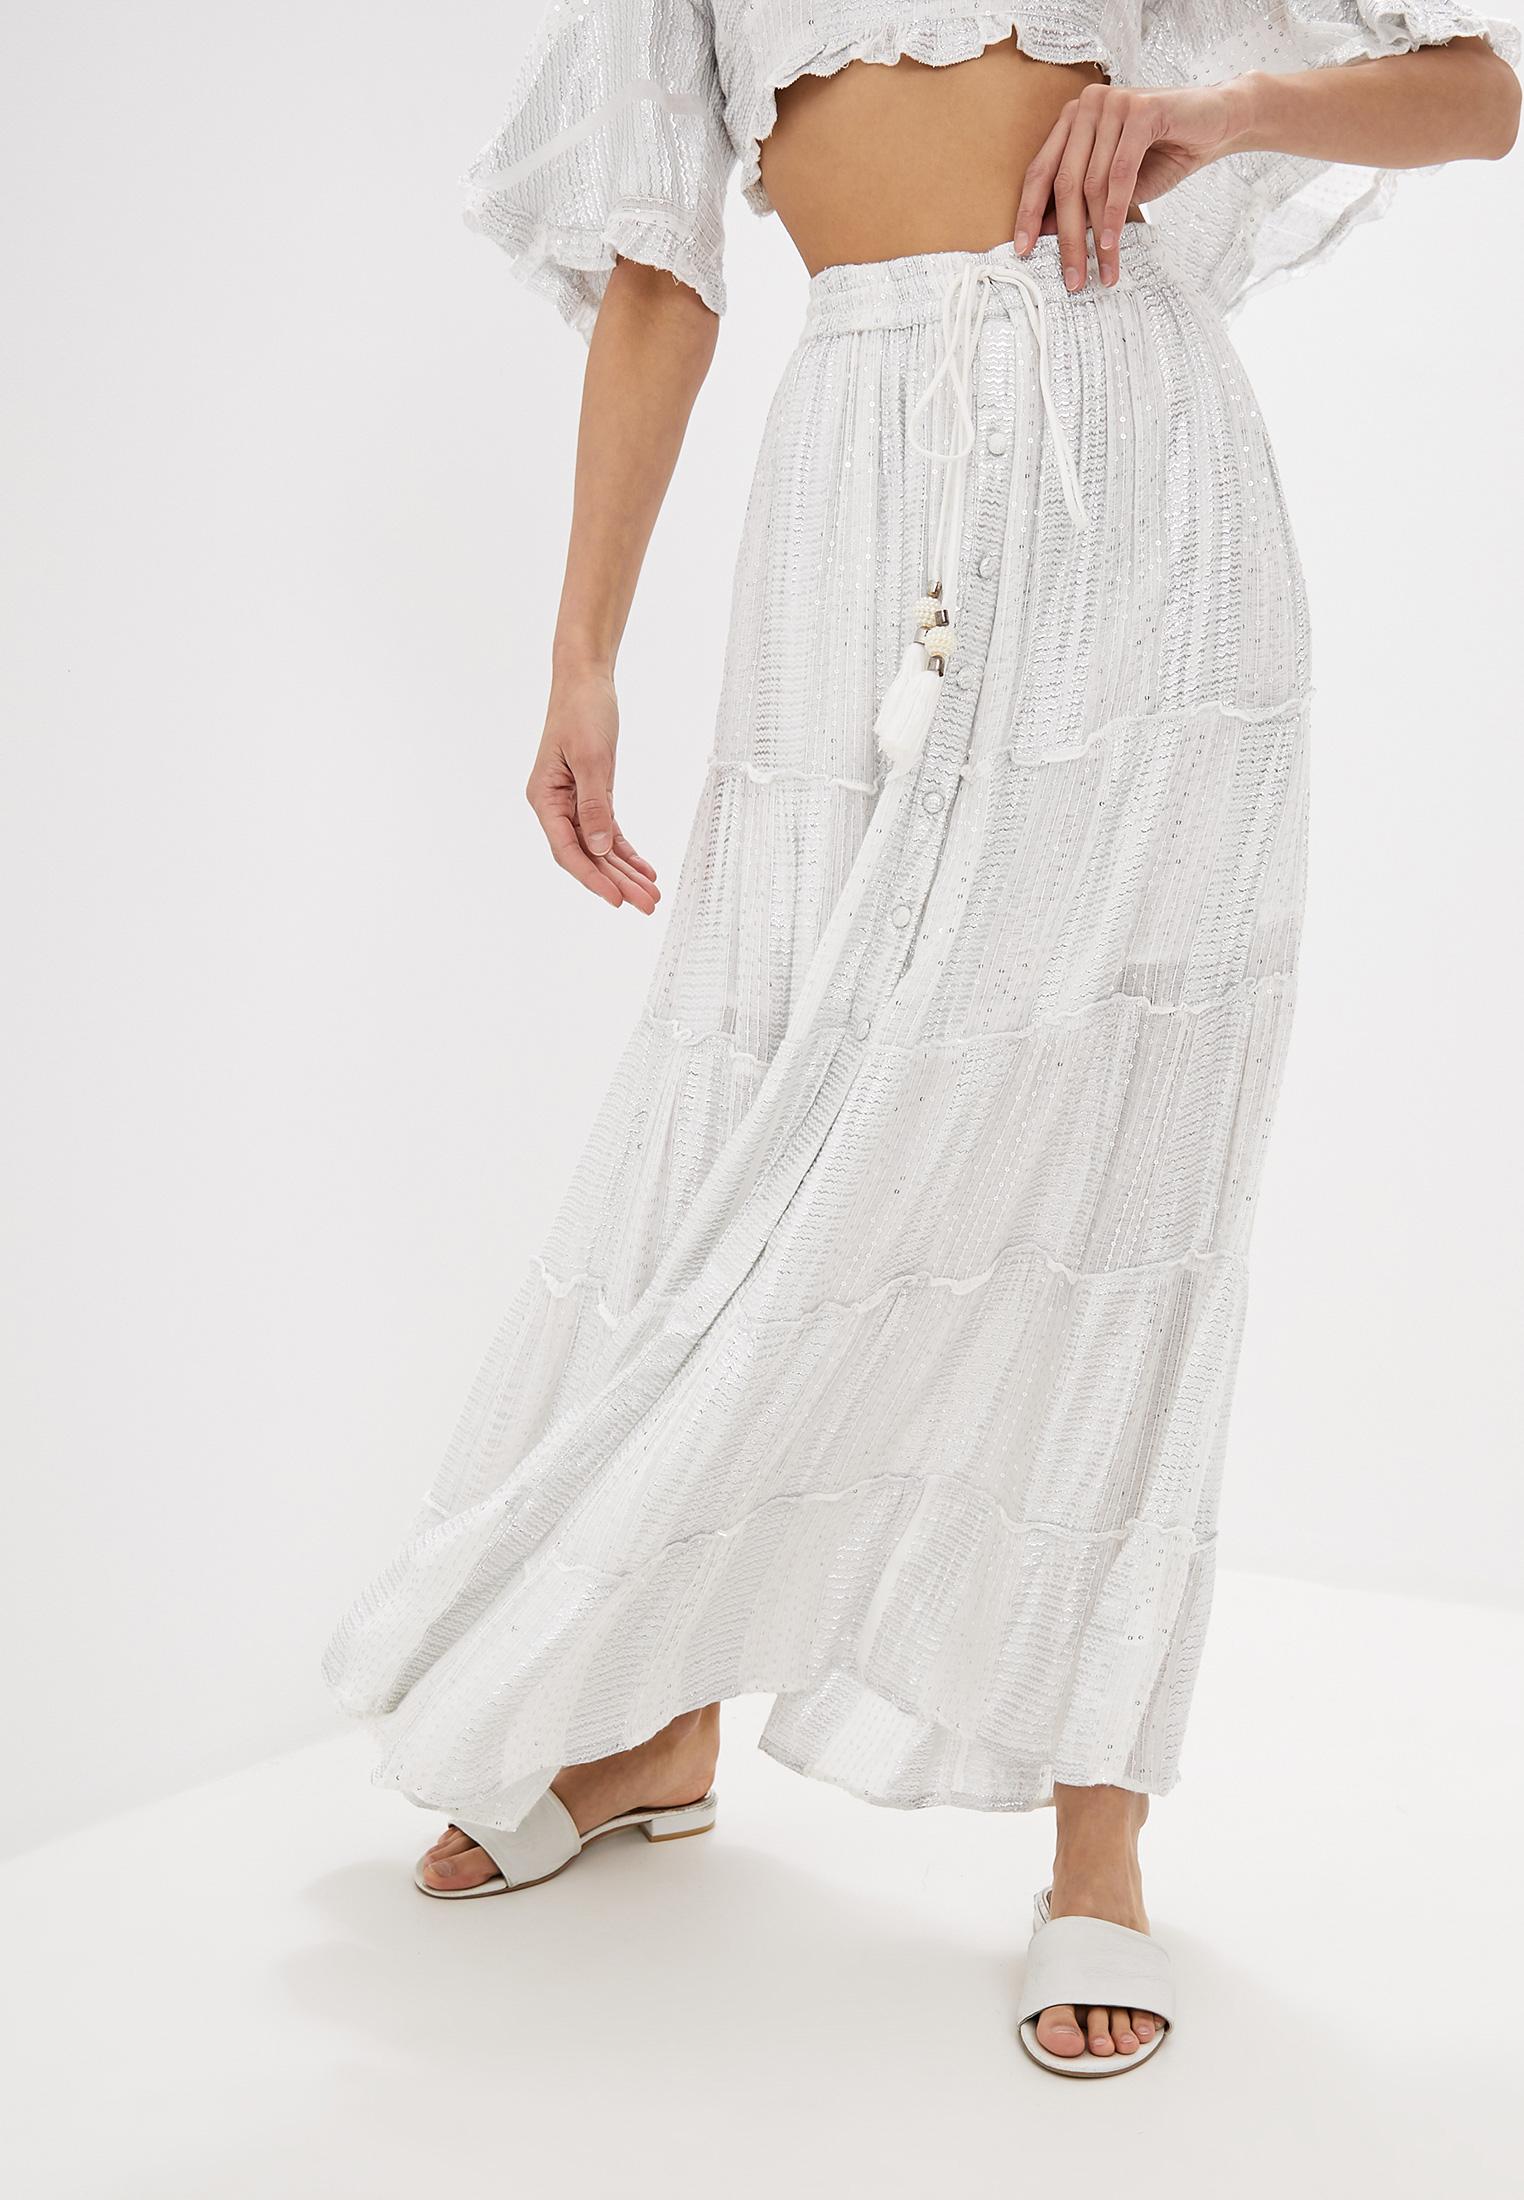 Широкая юбка Indiano Natural 2720 N-1VL